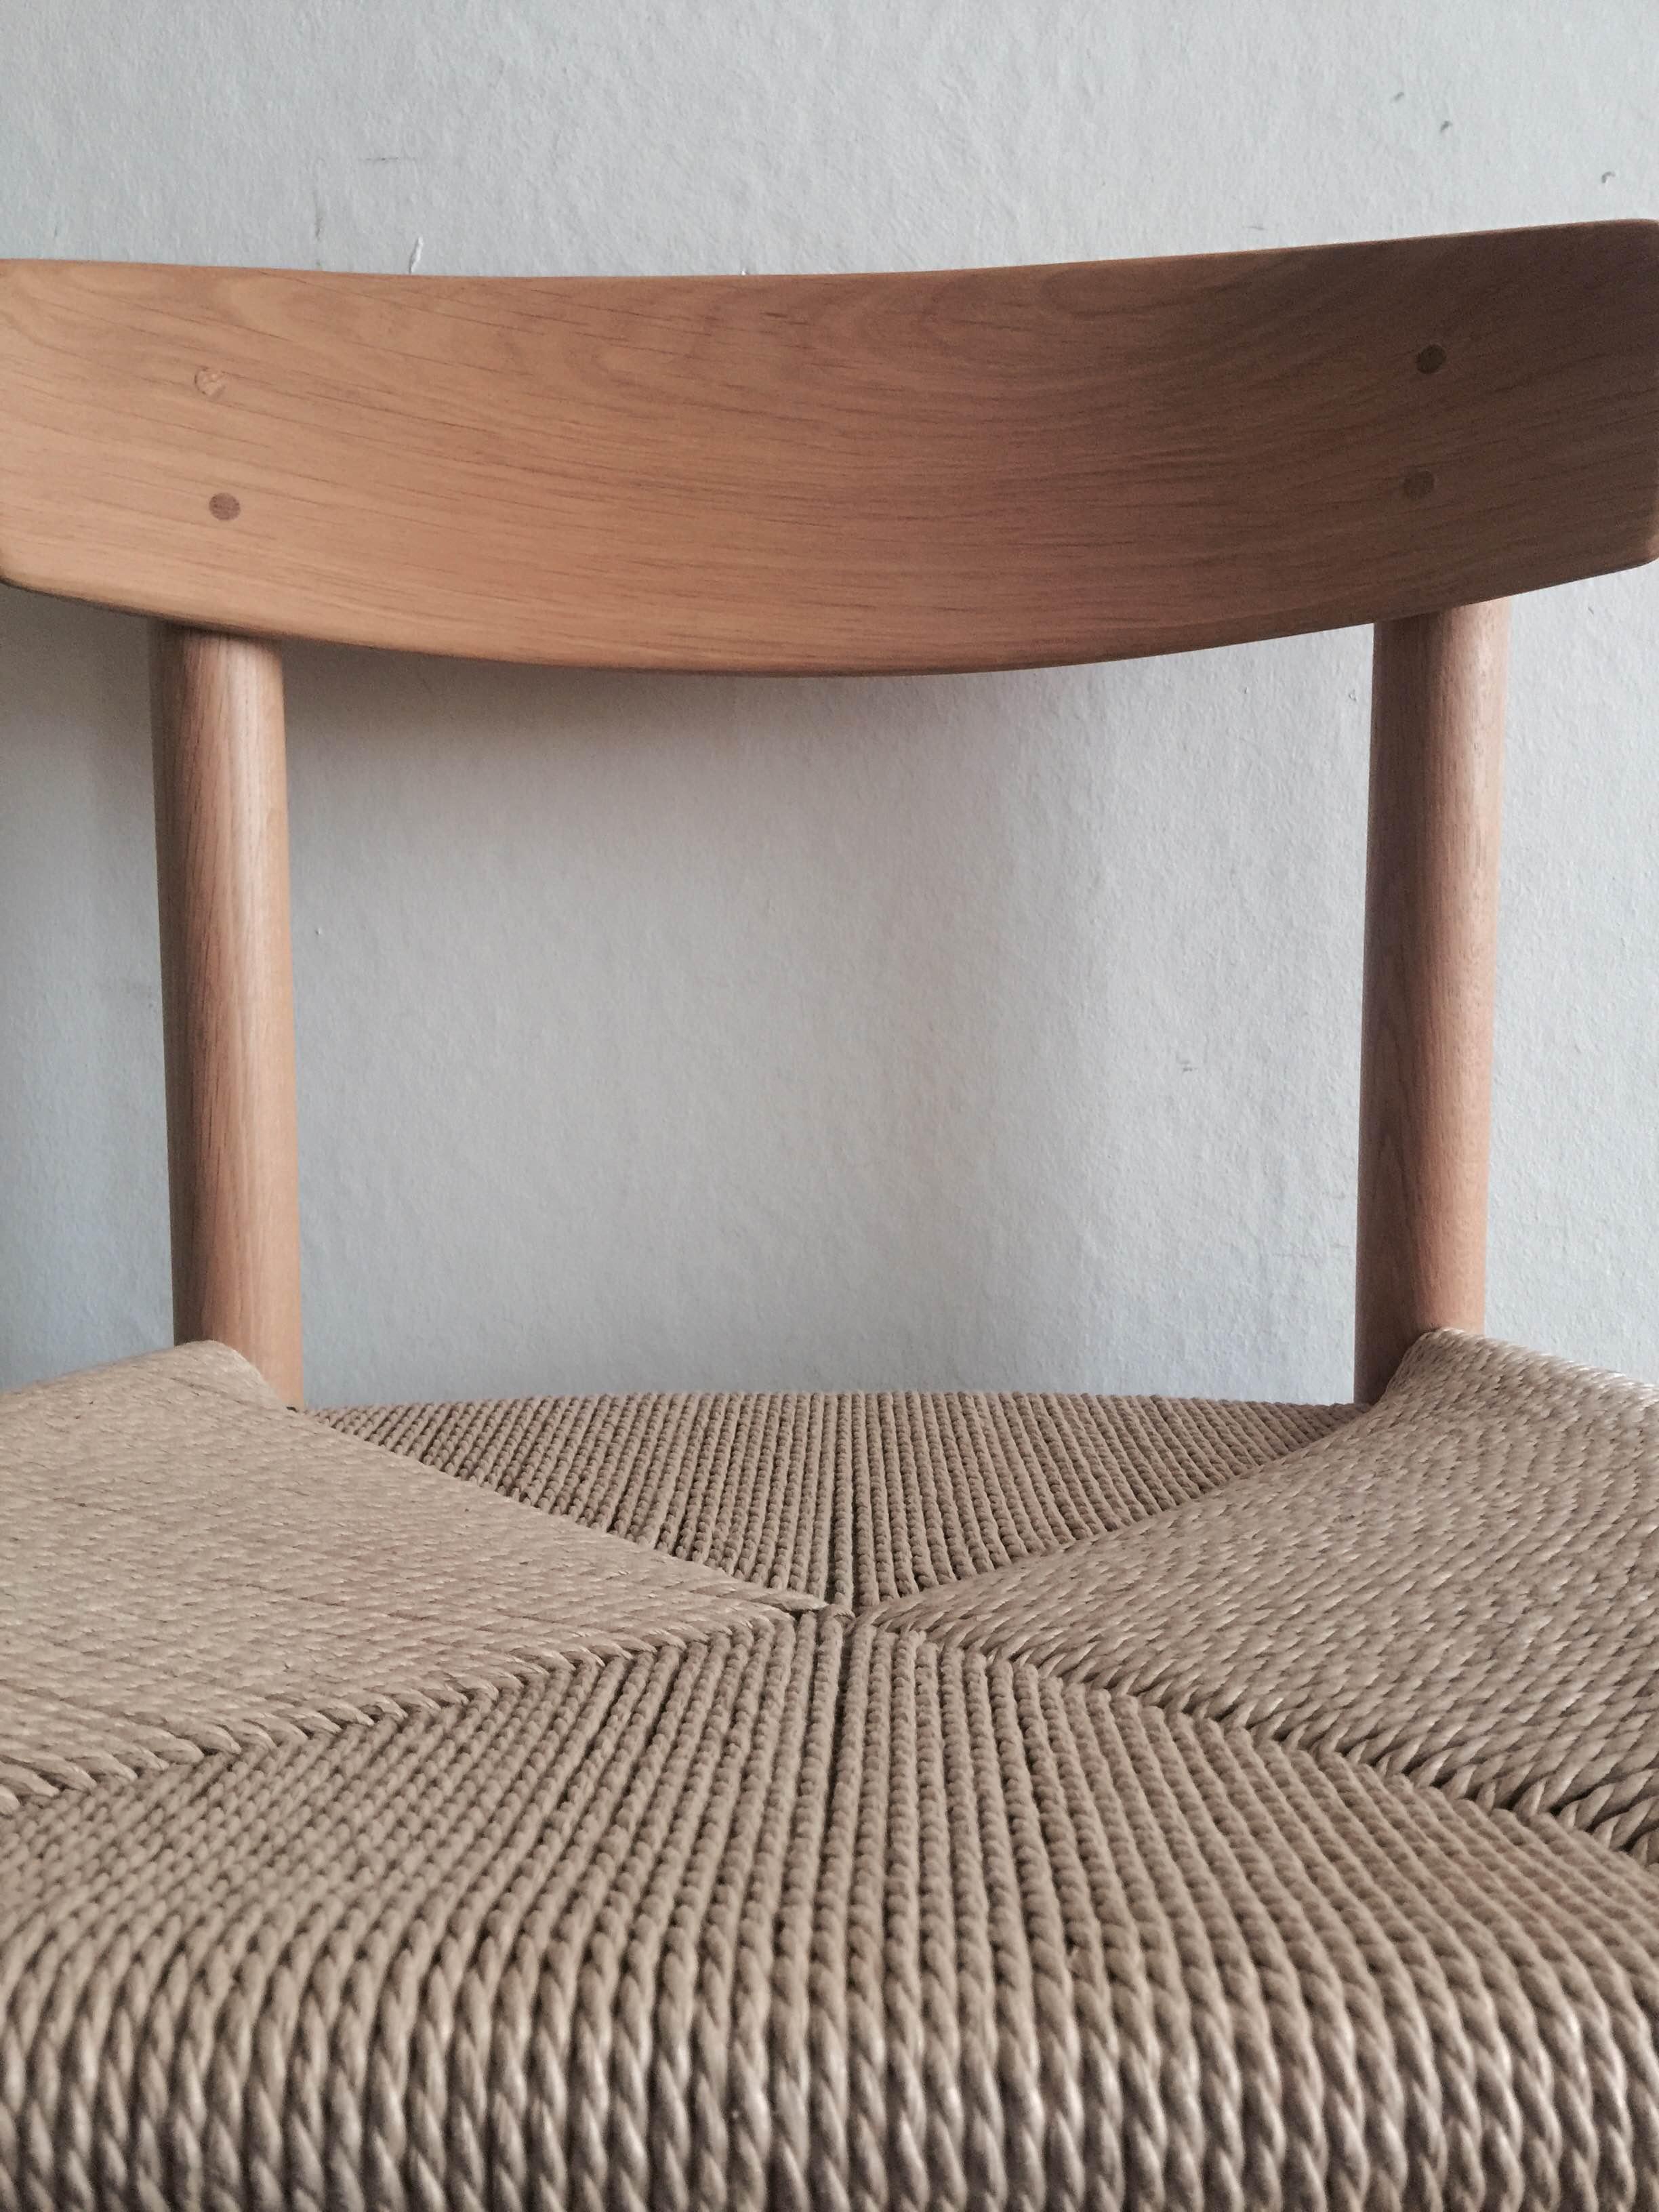 Oak Chair with Jute Seat £165 (details 3).JPG